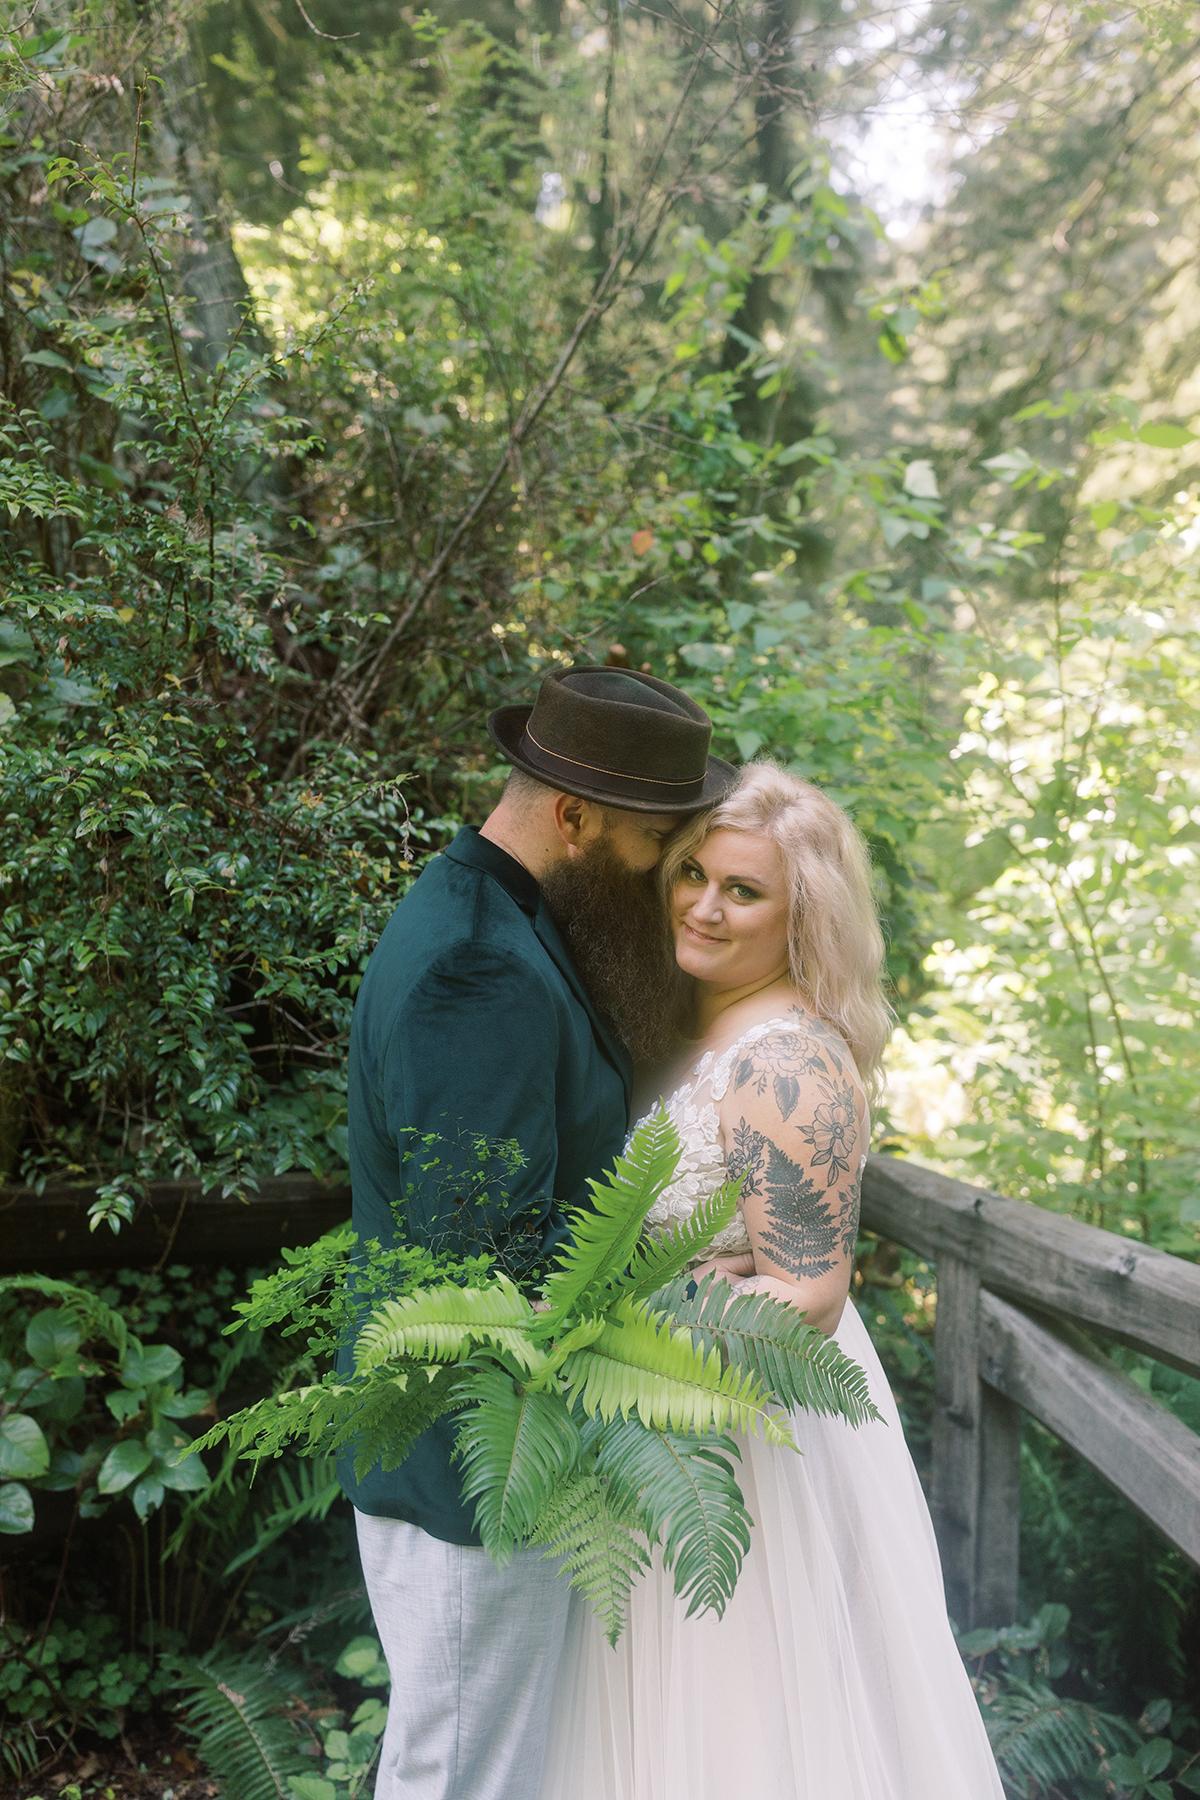 Prairie-Creek-Redwoods-State-Park-wedding-elopement-photos-00